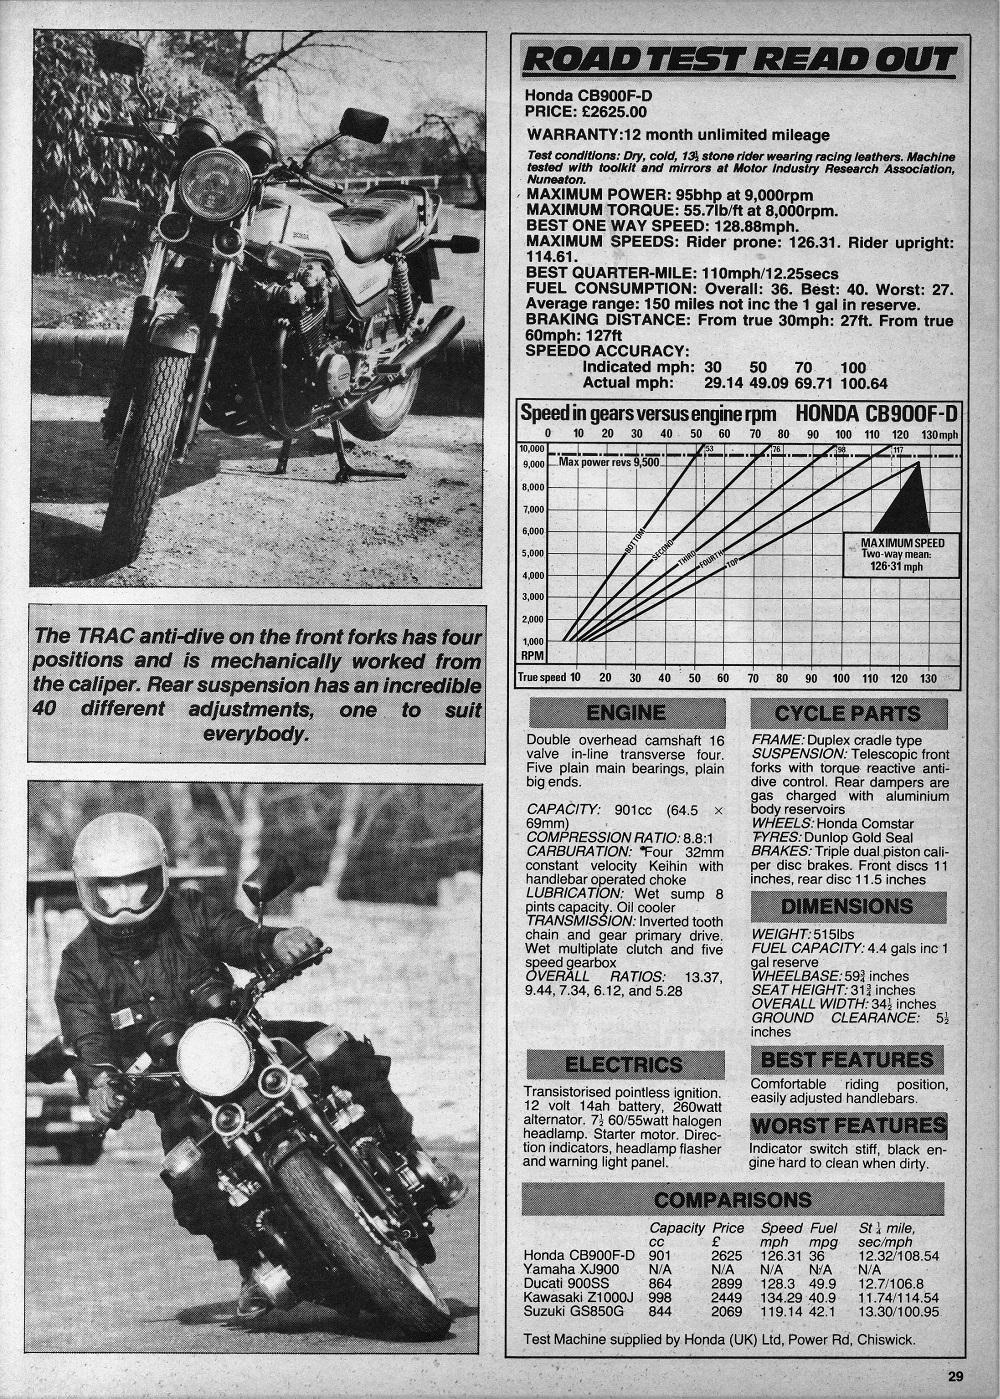 1983 Honda CB900F-D road test.4.jpg